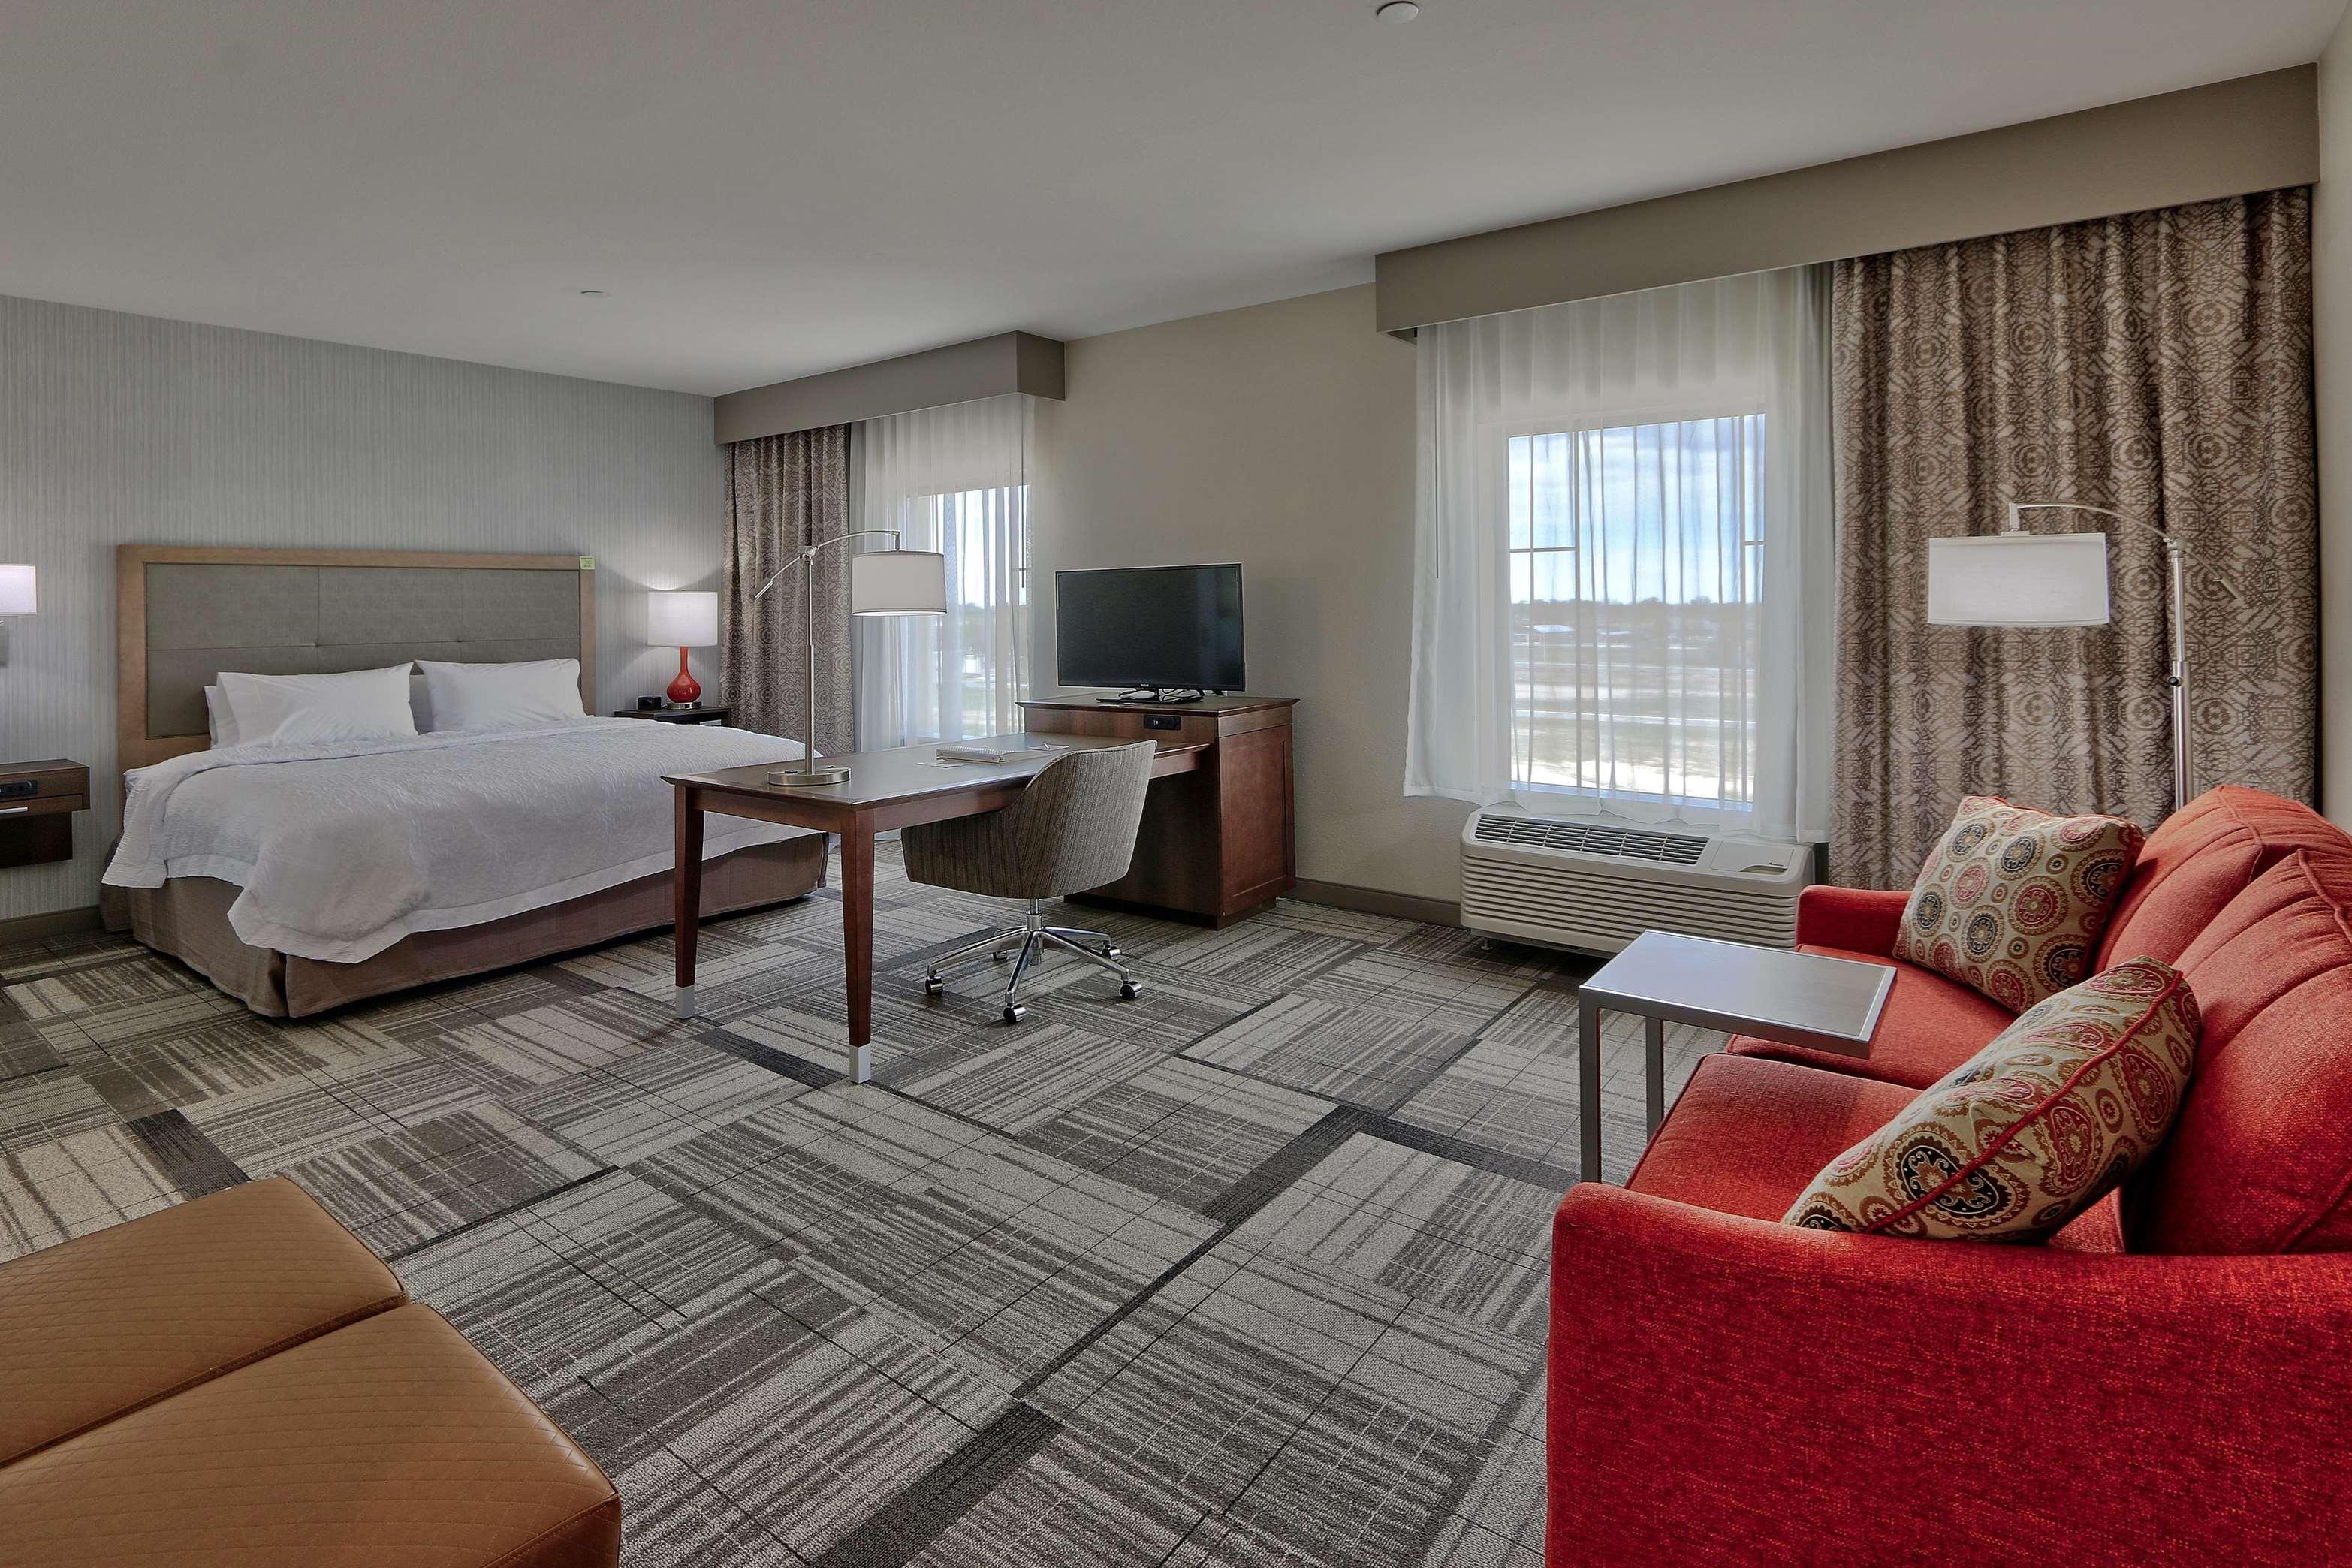 Hampton Inn & Suites Artesia image 30